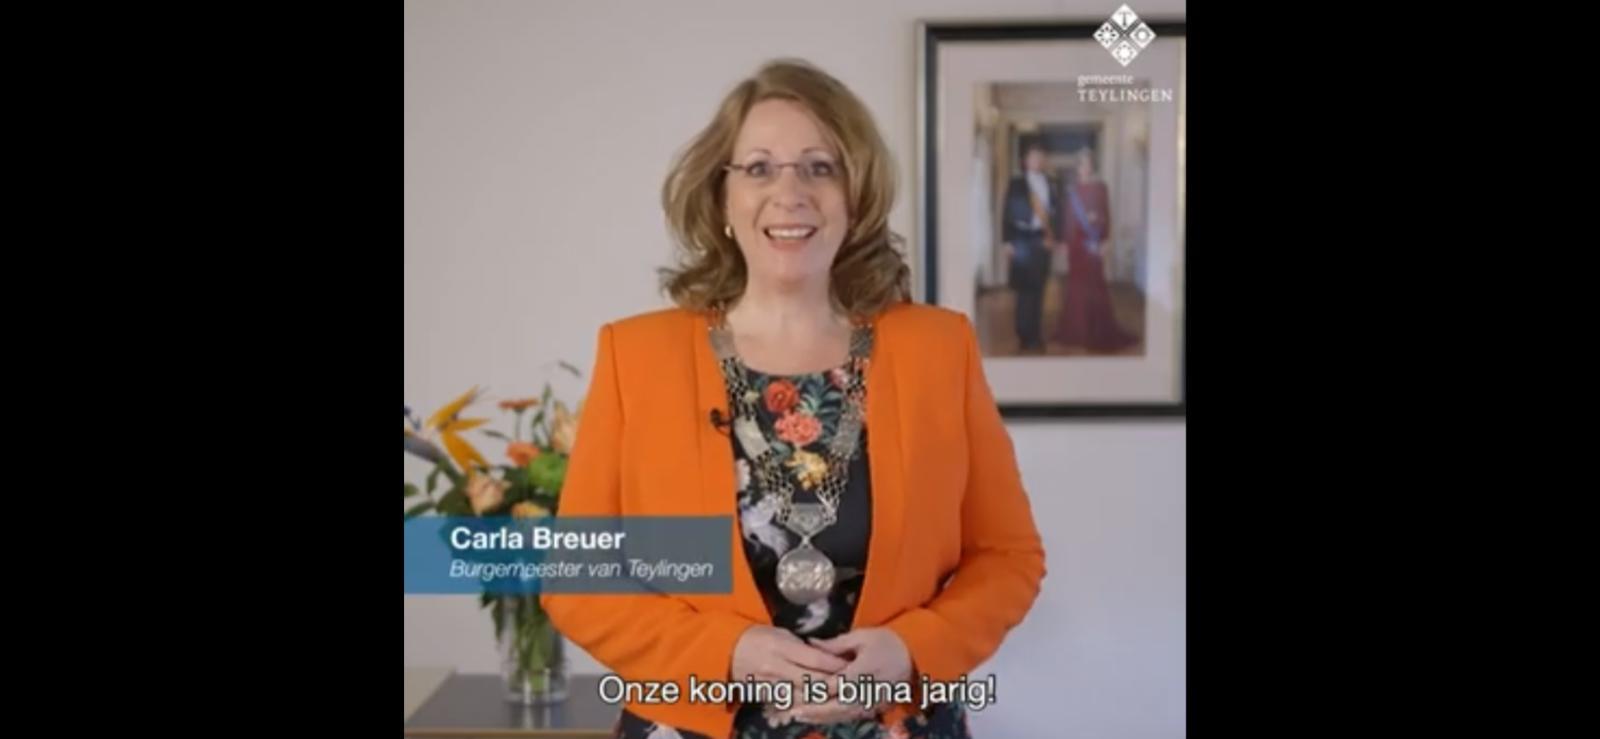 Oproep burgemeester Carla Breuer